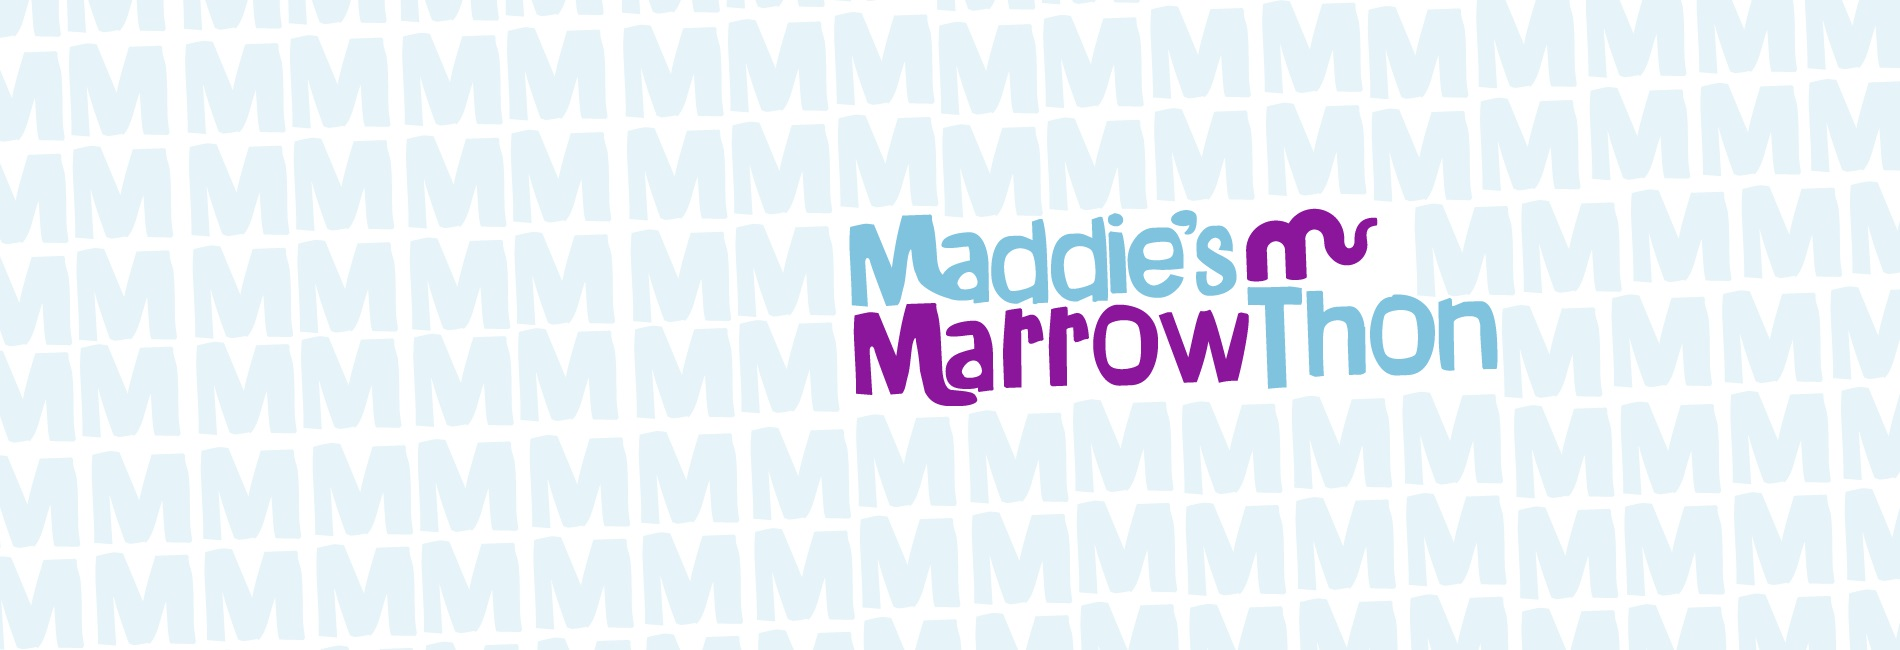 Maddie's MarrowThon